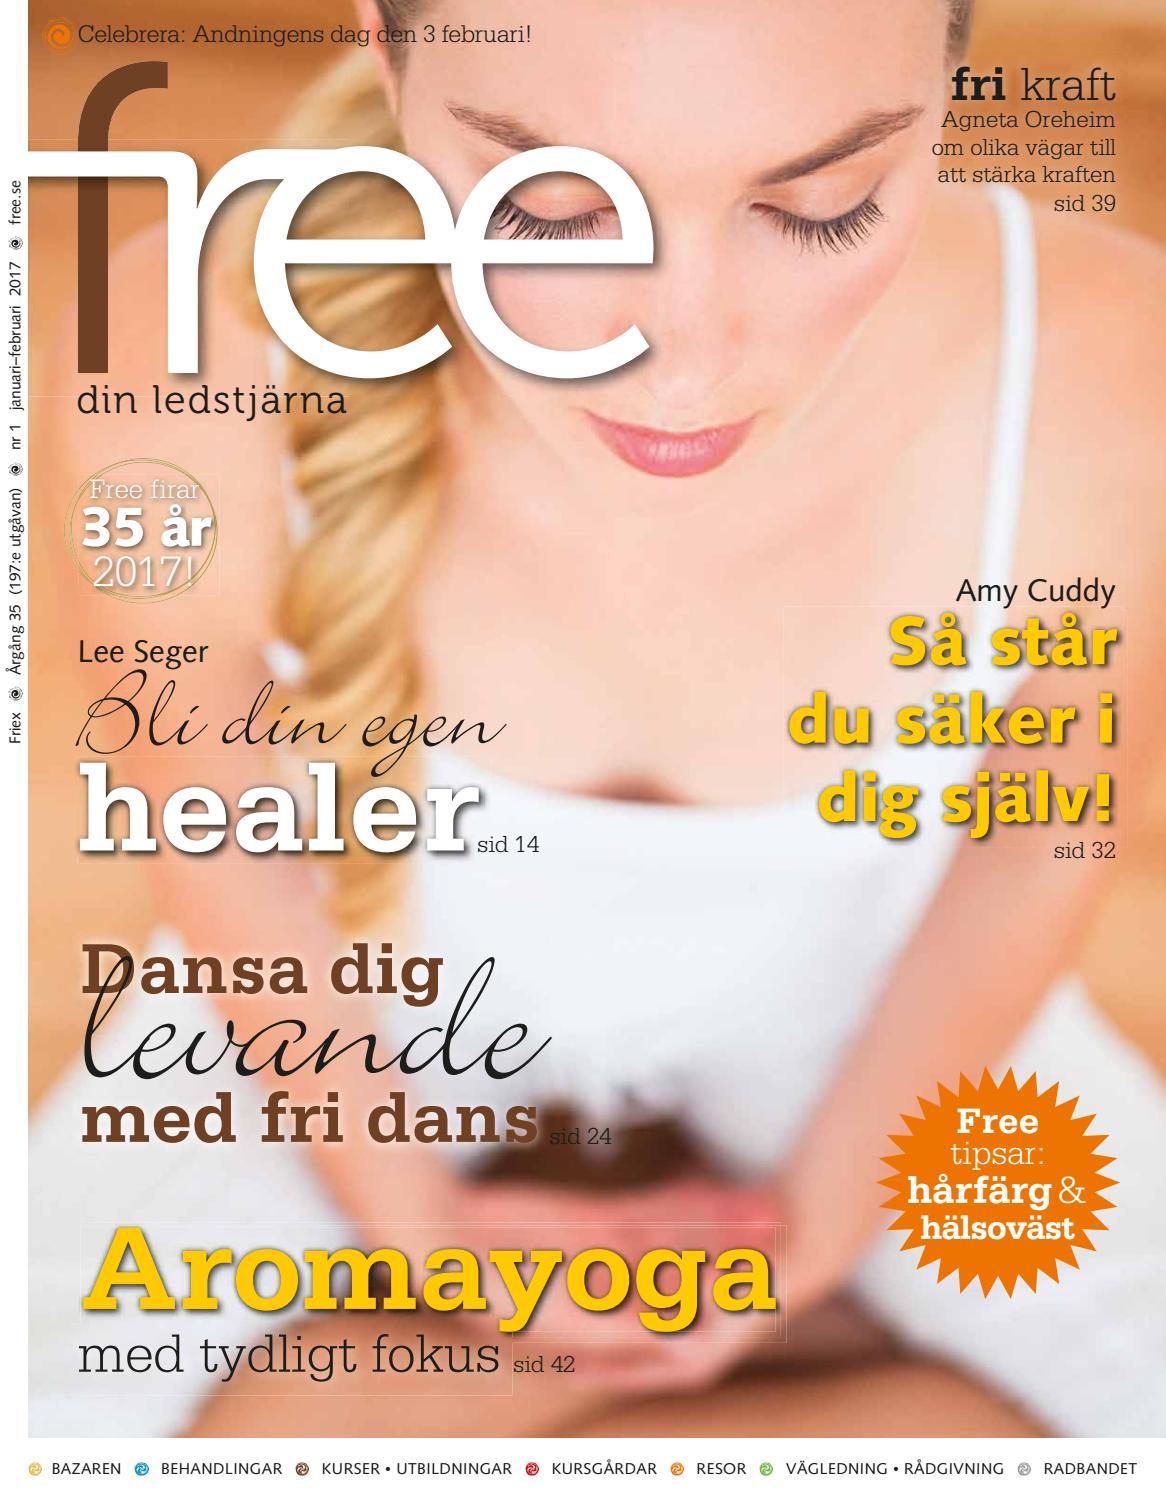 katalog massage fantasi nära borås